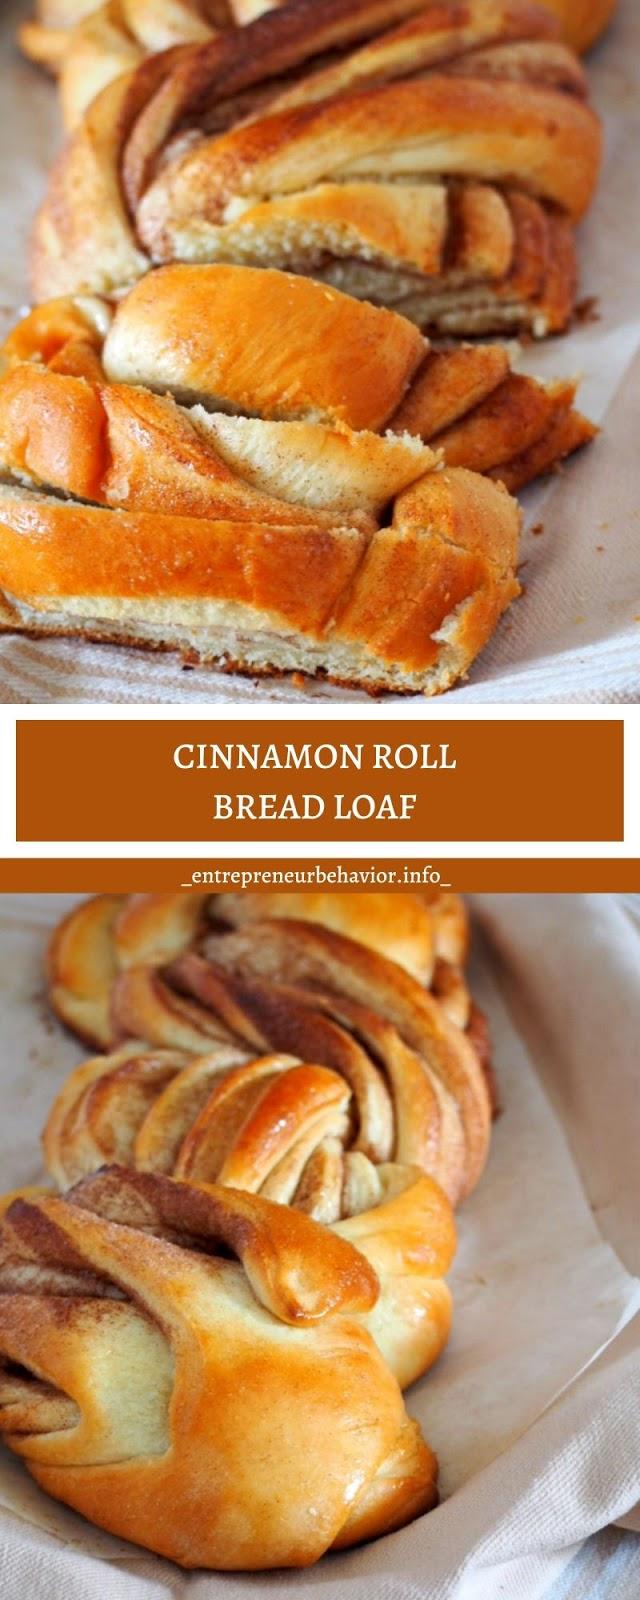 CINNAMON ROLL BREAD LOAF